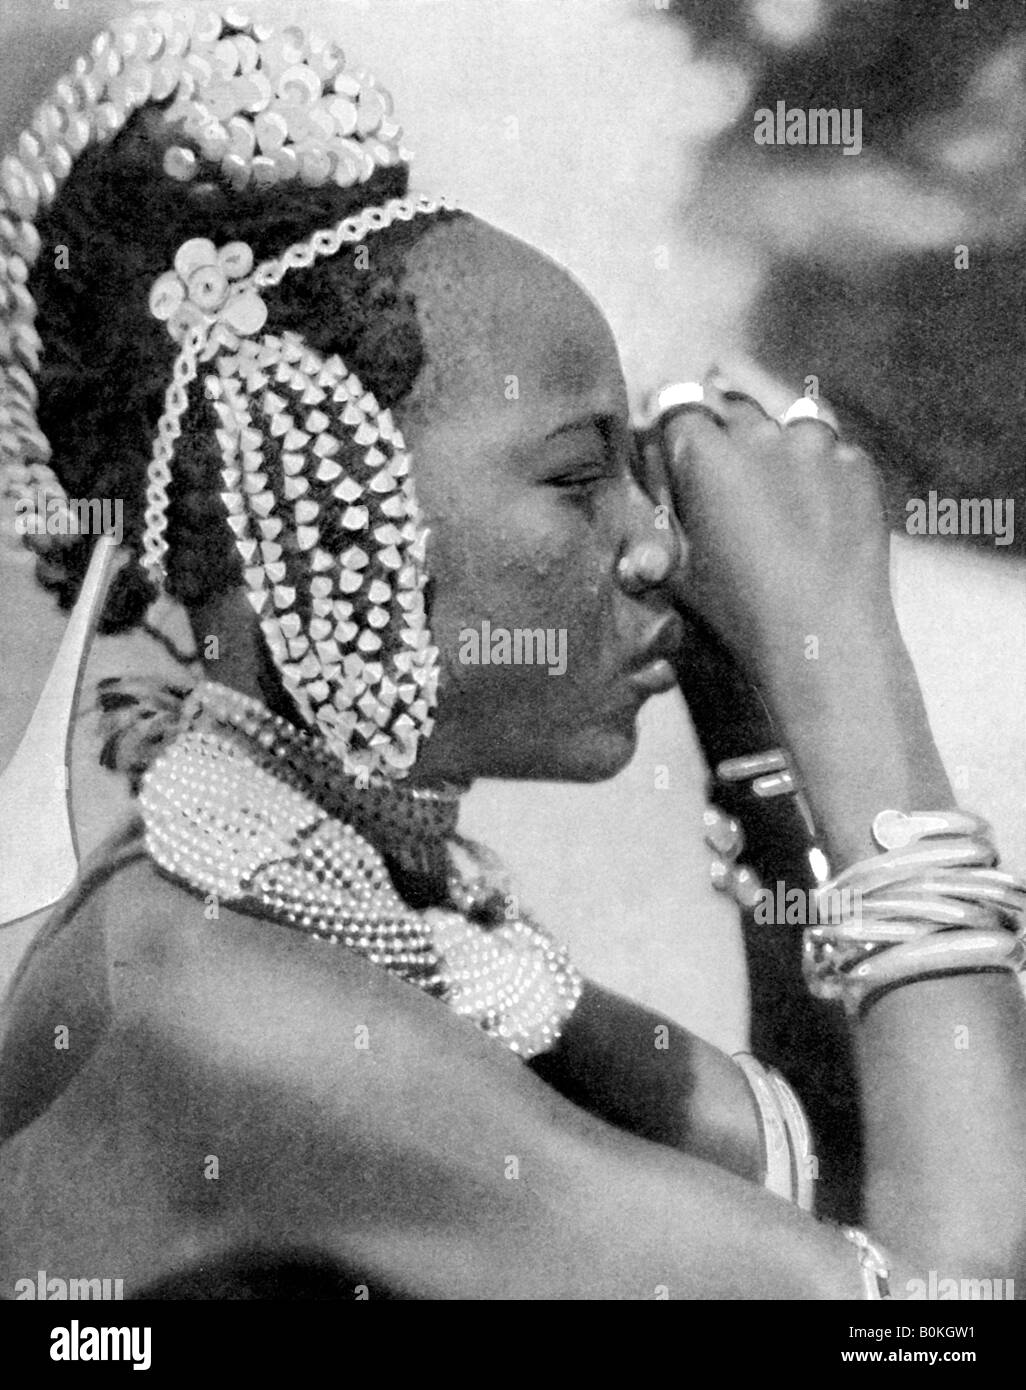 A Nigerian girl, 1936 Artist: Wide World Photos - Stock Image